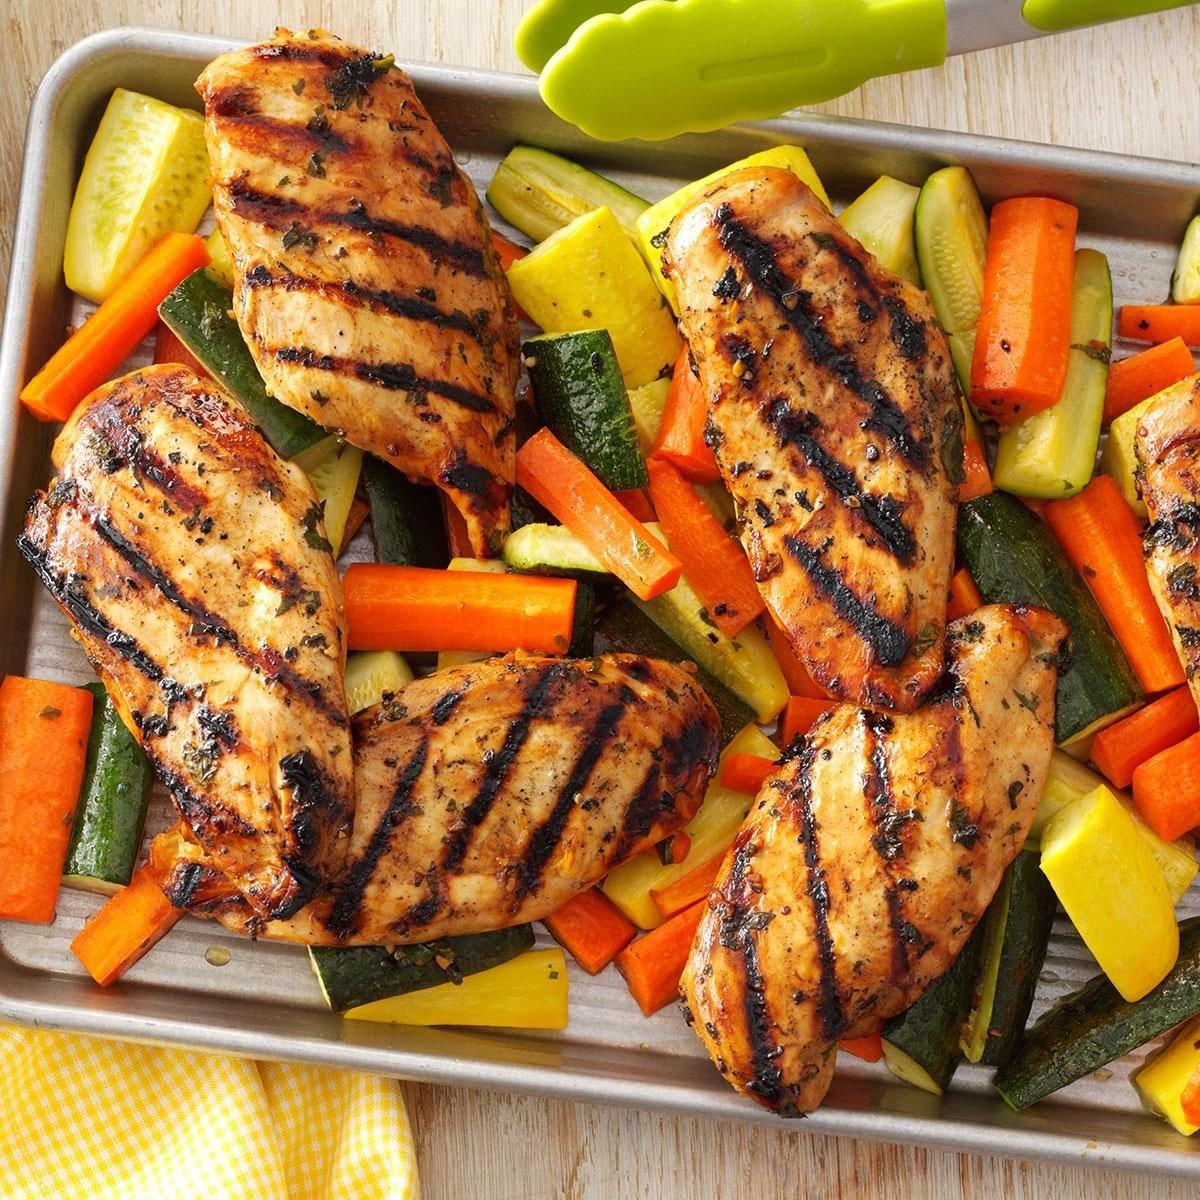 Apple-Marinated Chicken & Vegetables Recipe